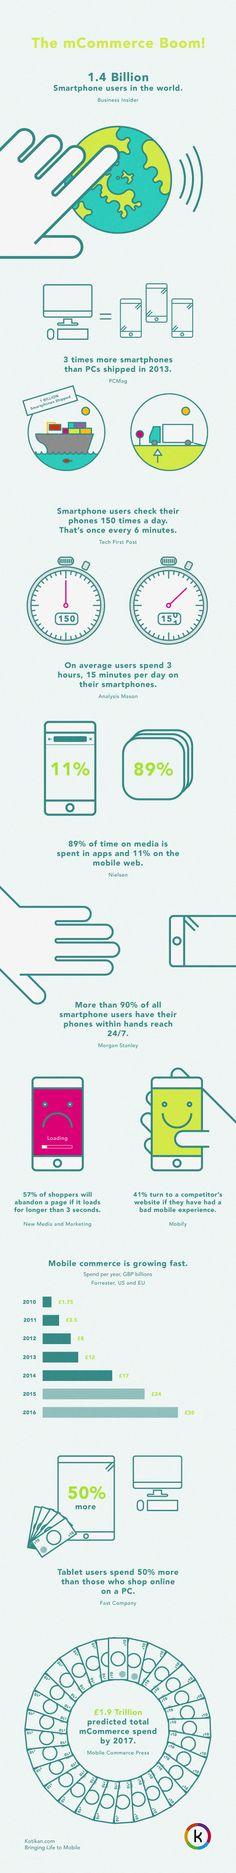 mCommerce Infographic - Dan Leckie